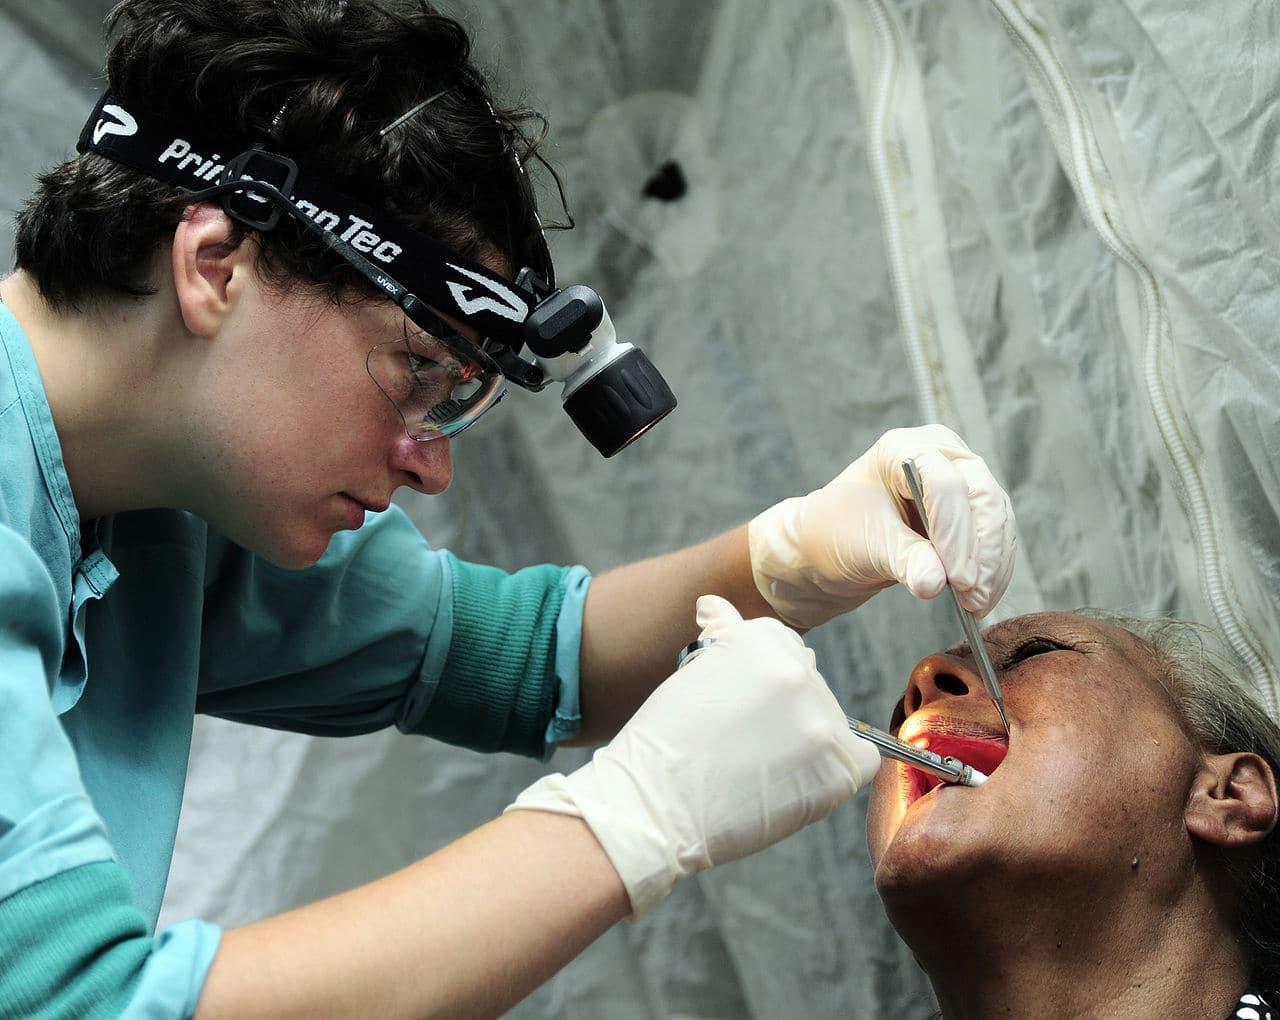 Se alerta a pacientes dentales por falta de higiene en clinica de Burlington